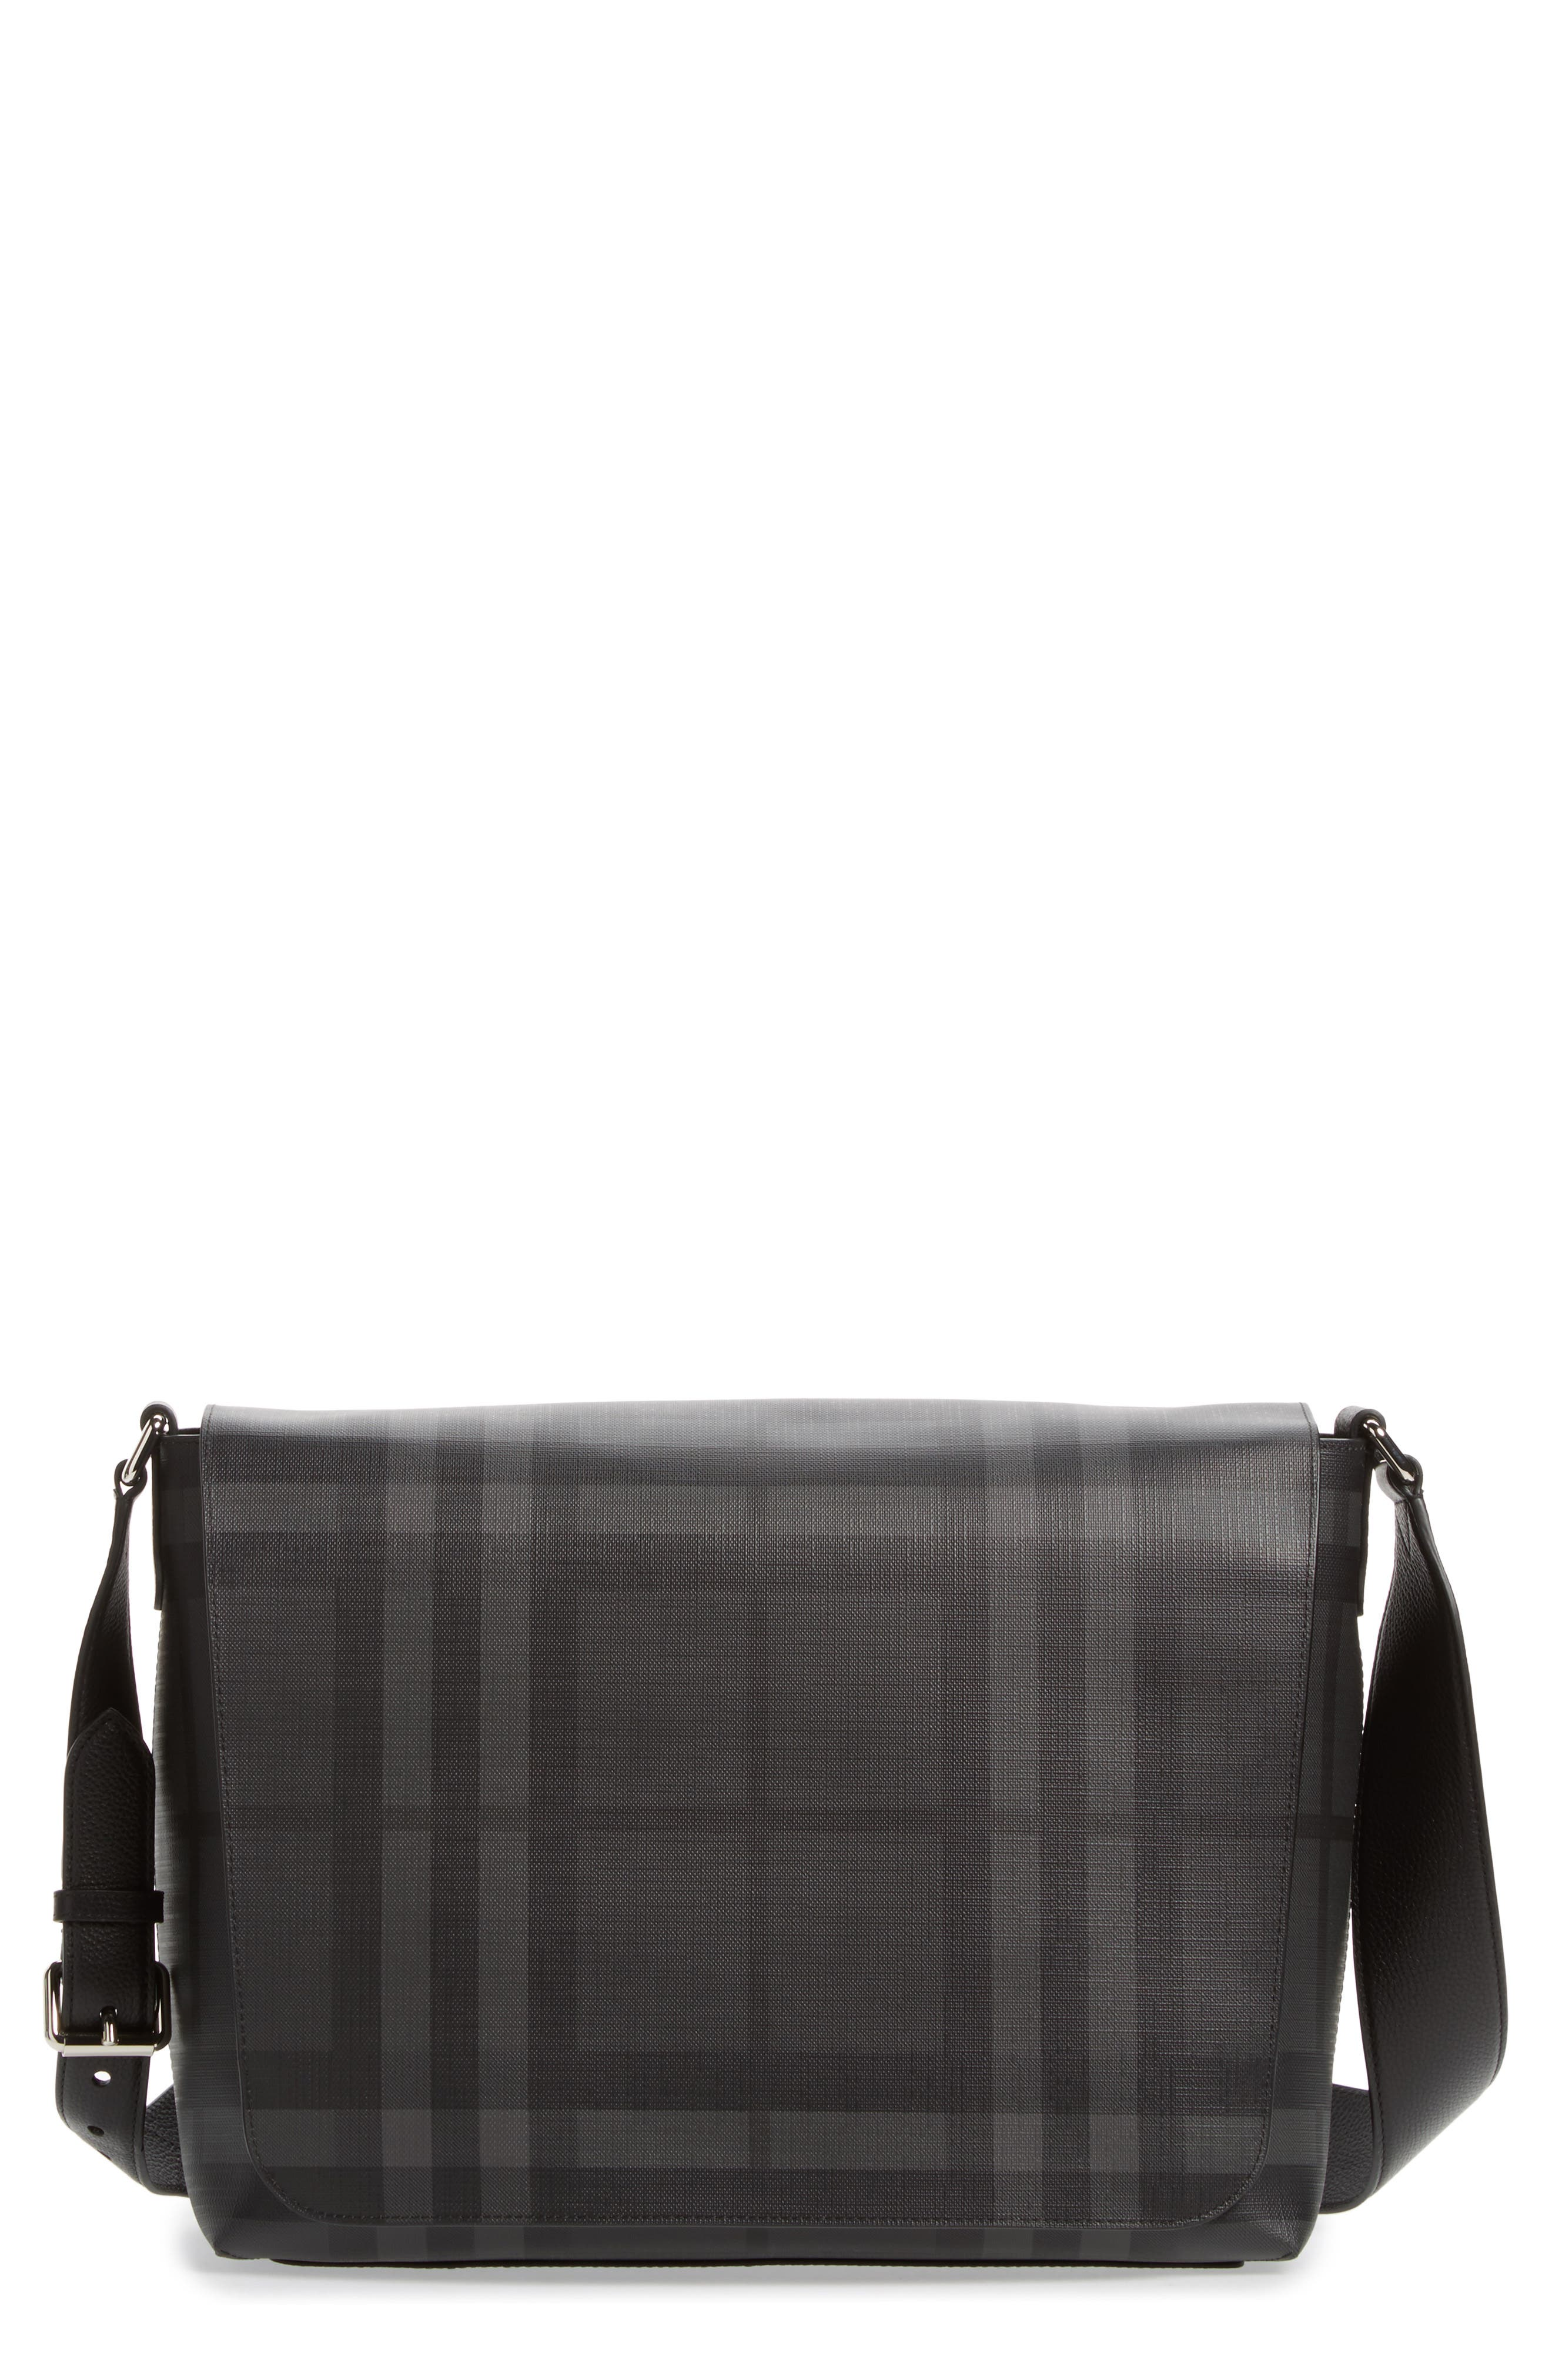 London Check Messenger Bag,                             Main thumbnail 1, color,                             Charcoal/ Black